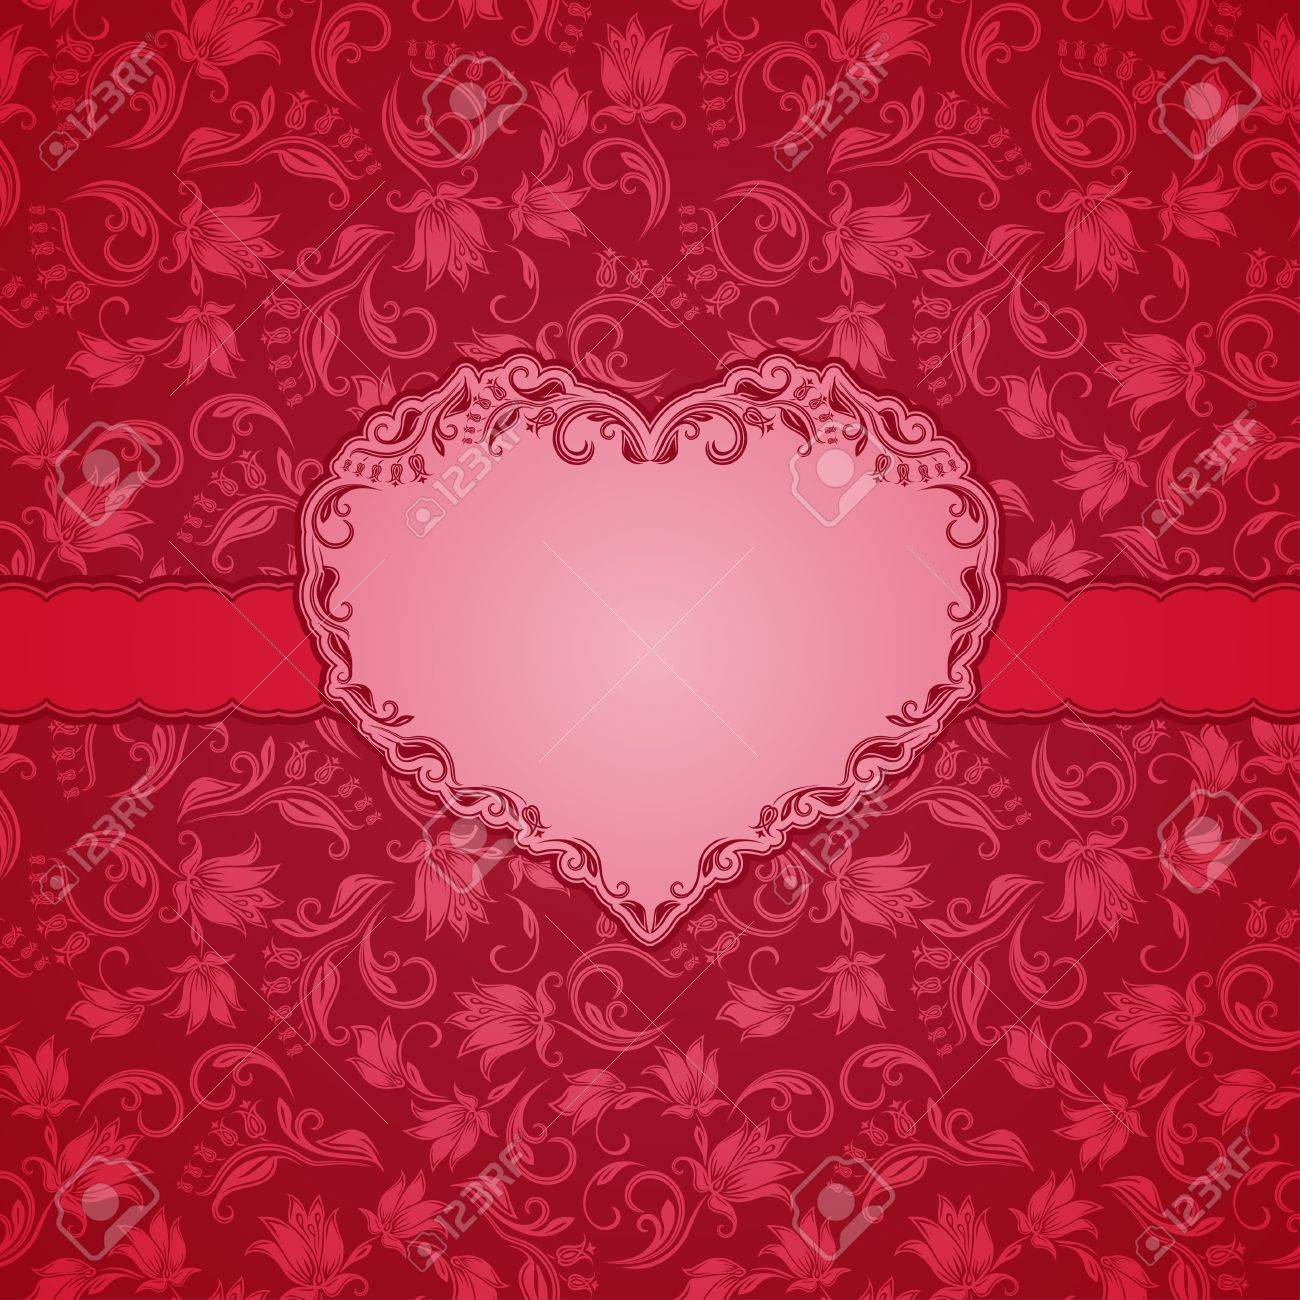 Groß Rahmen Valentinebild Galerie - Benutzerdefinierte Bilderrahmen ...